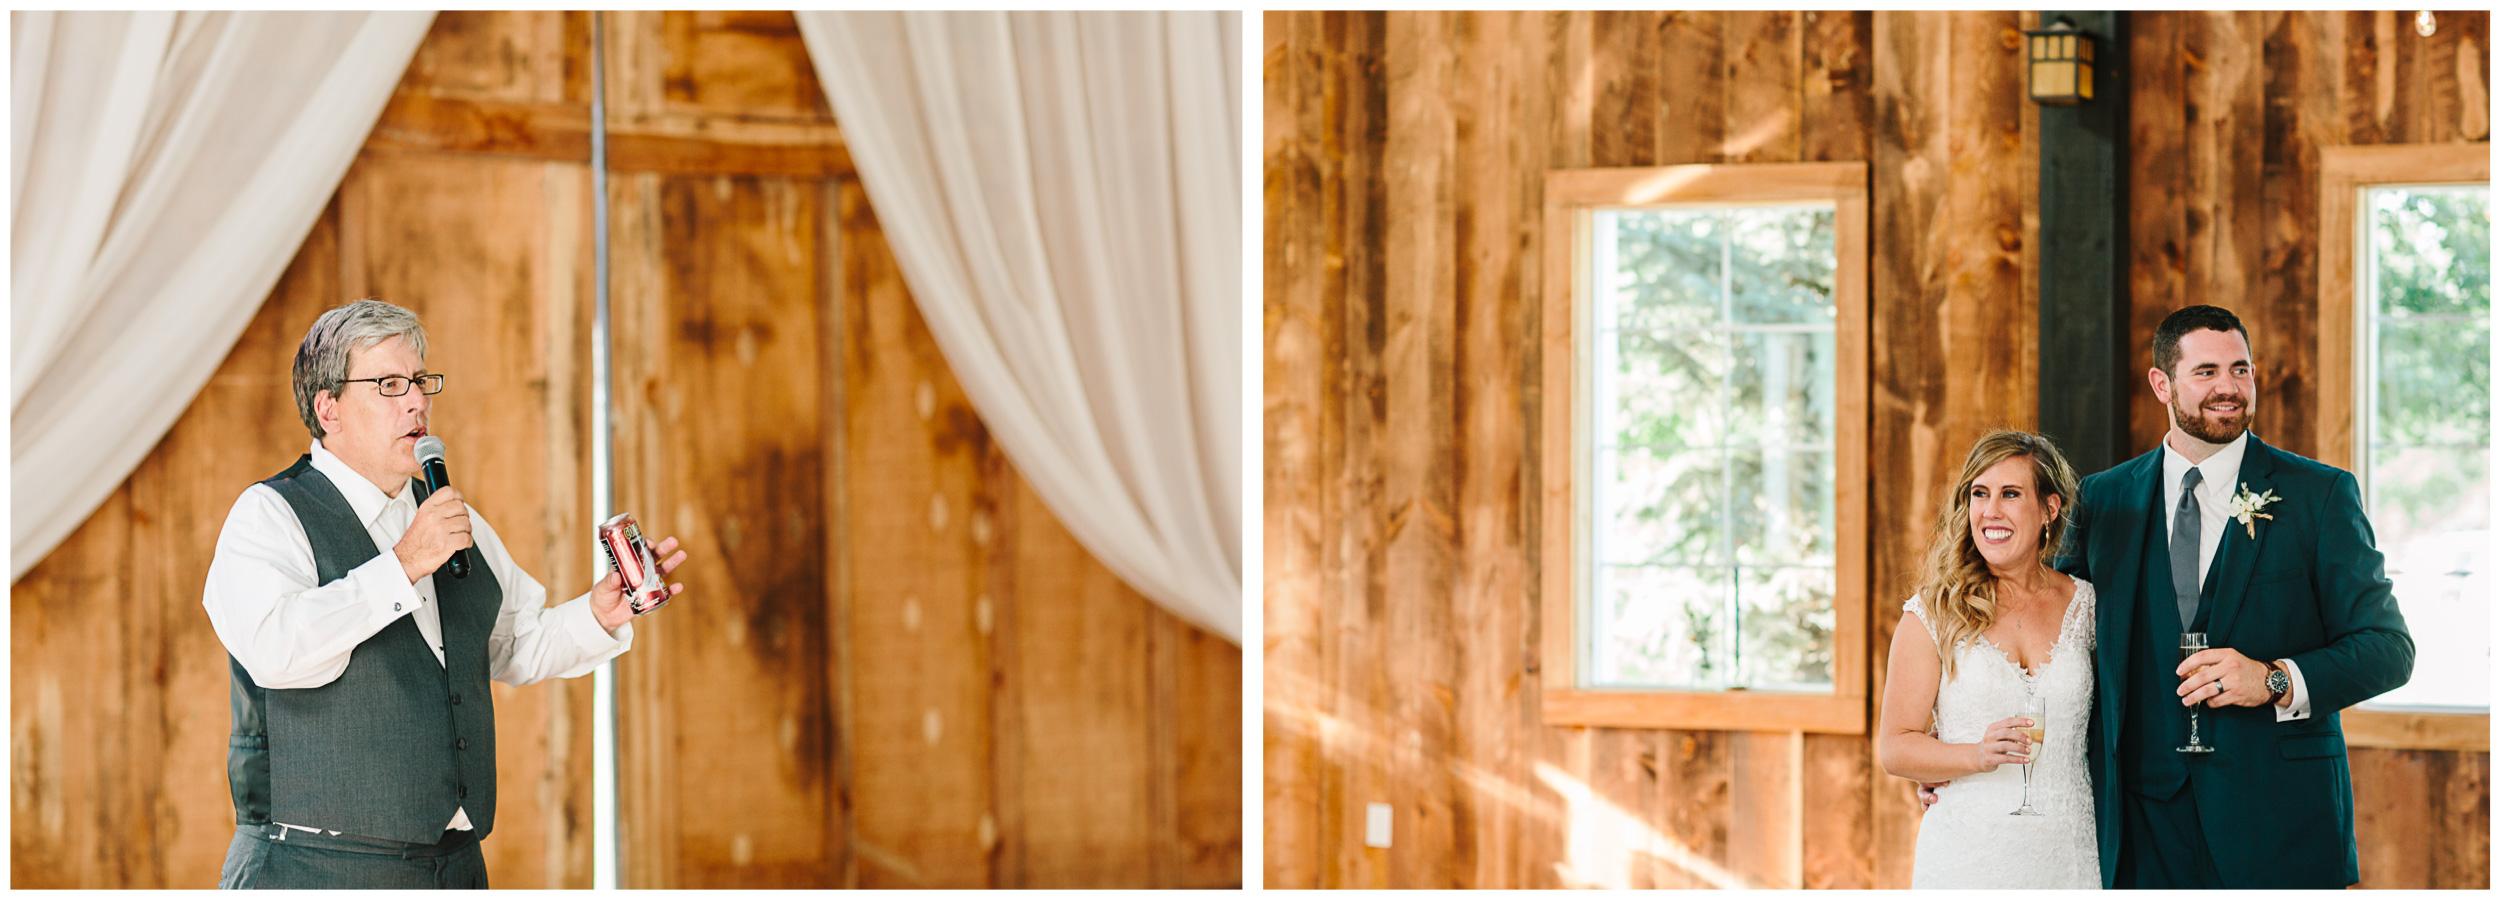 redlodge_montana_wedding_82.jpg